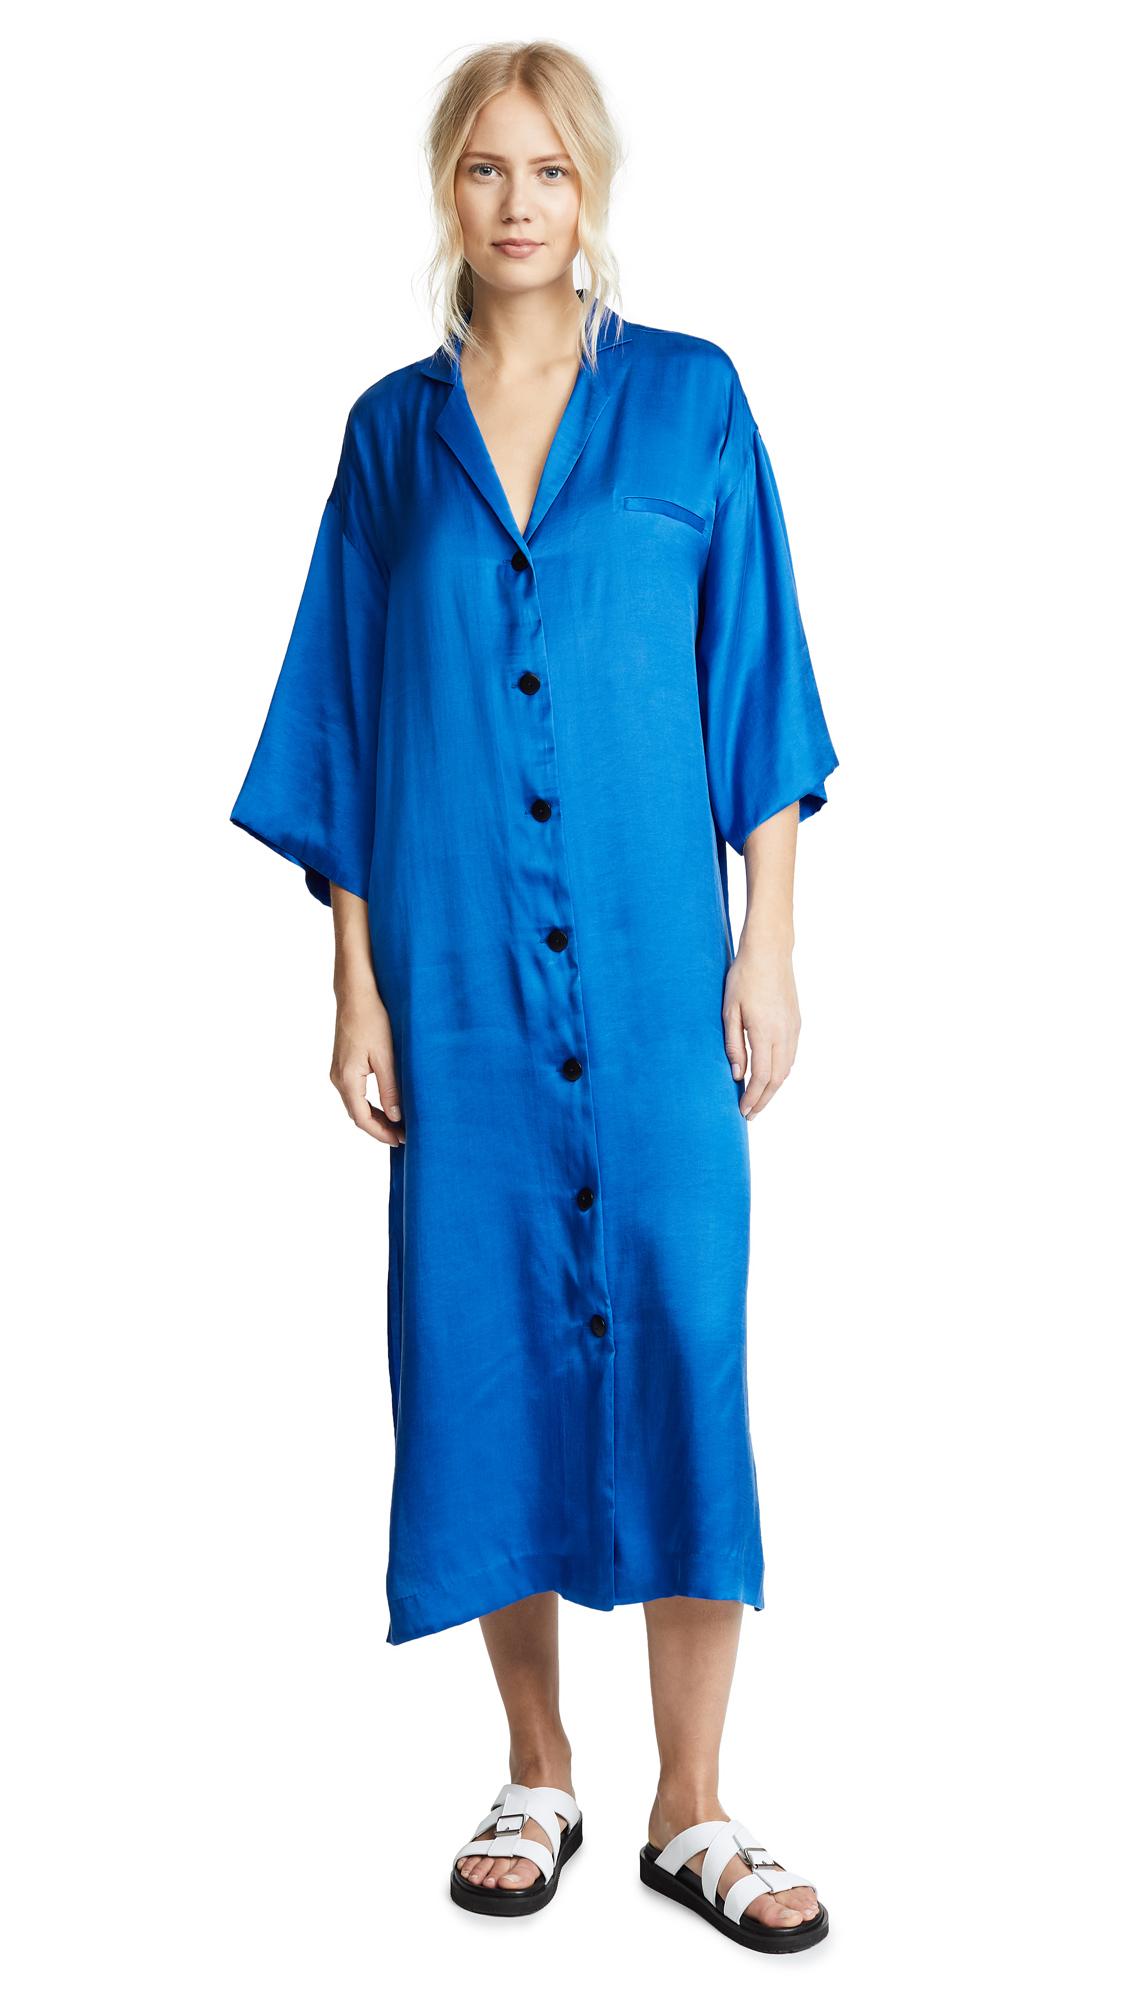 Mara Hoffman Saga Shirt Dress - Blue